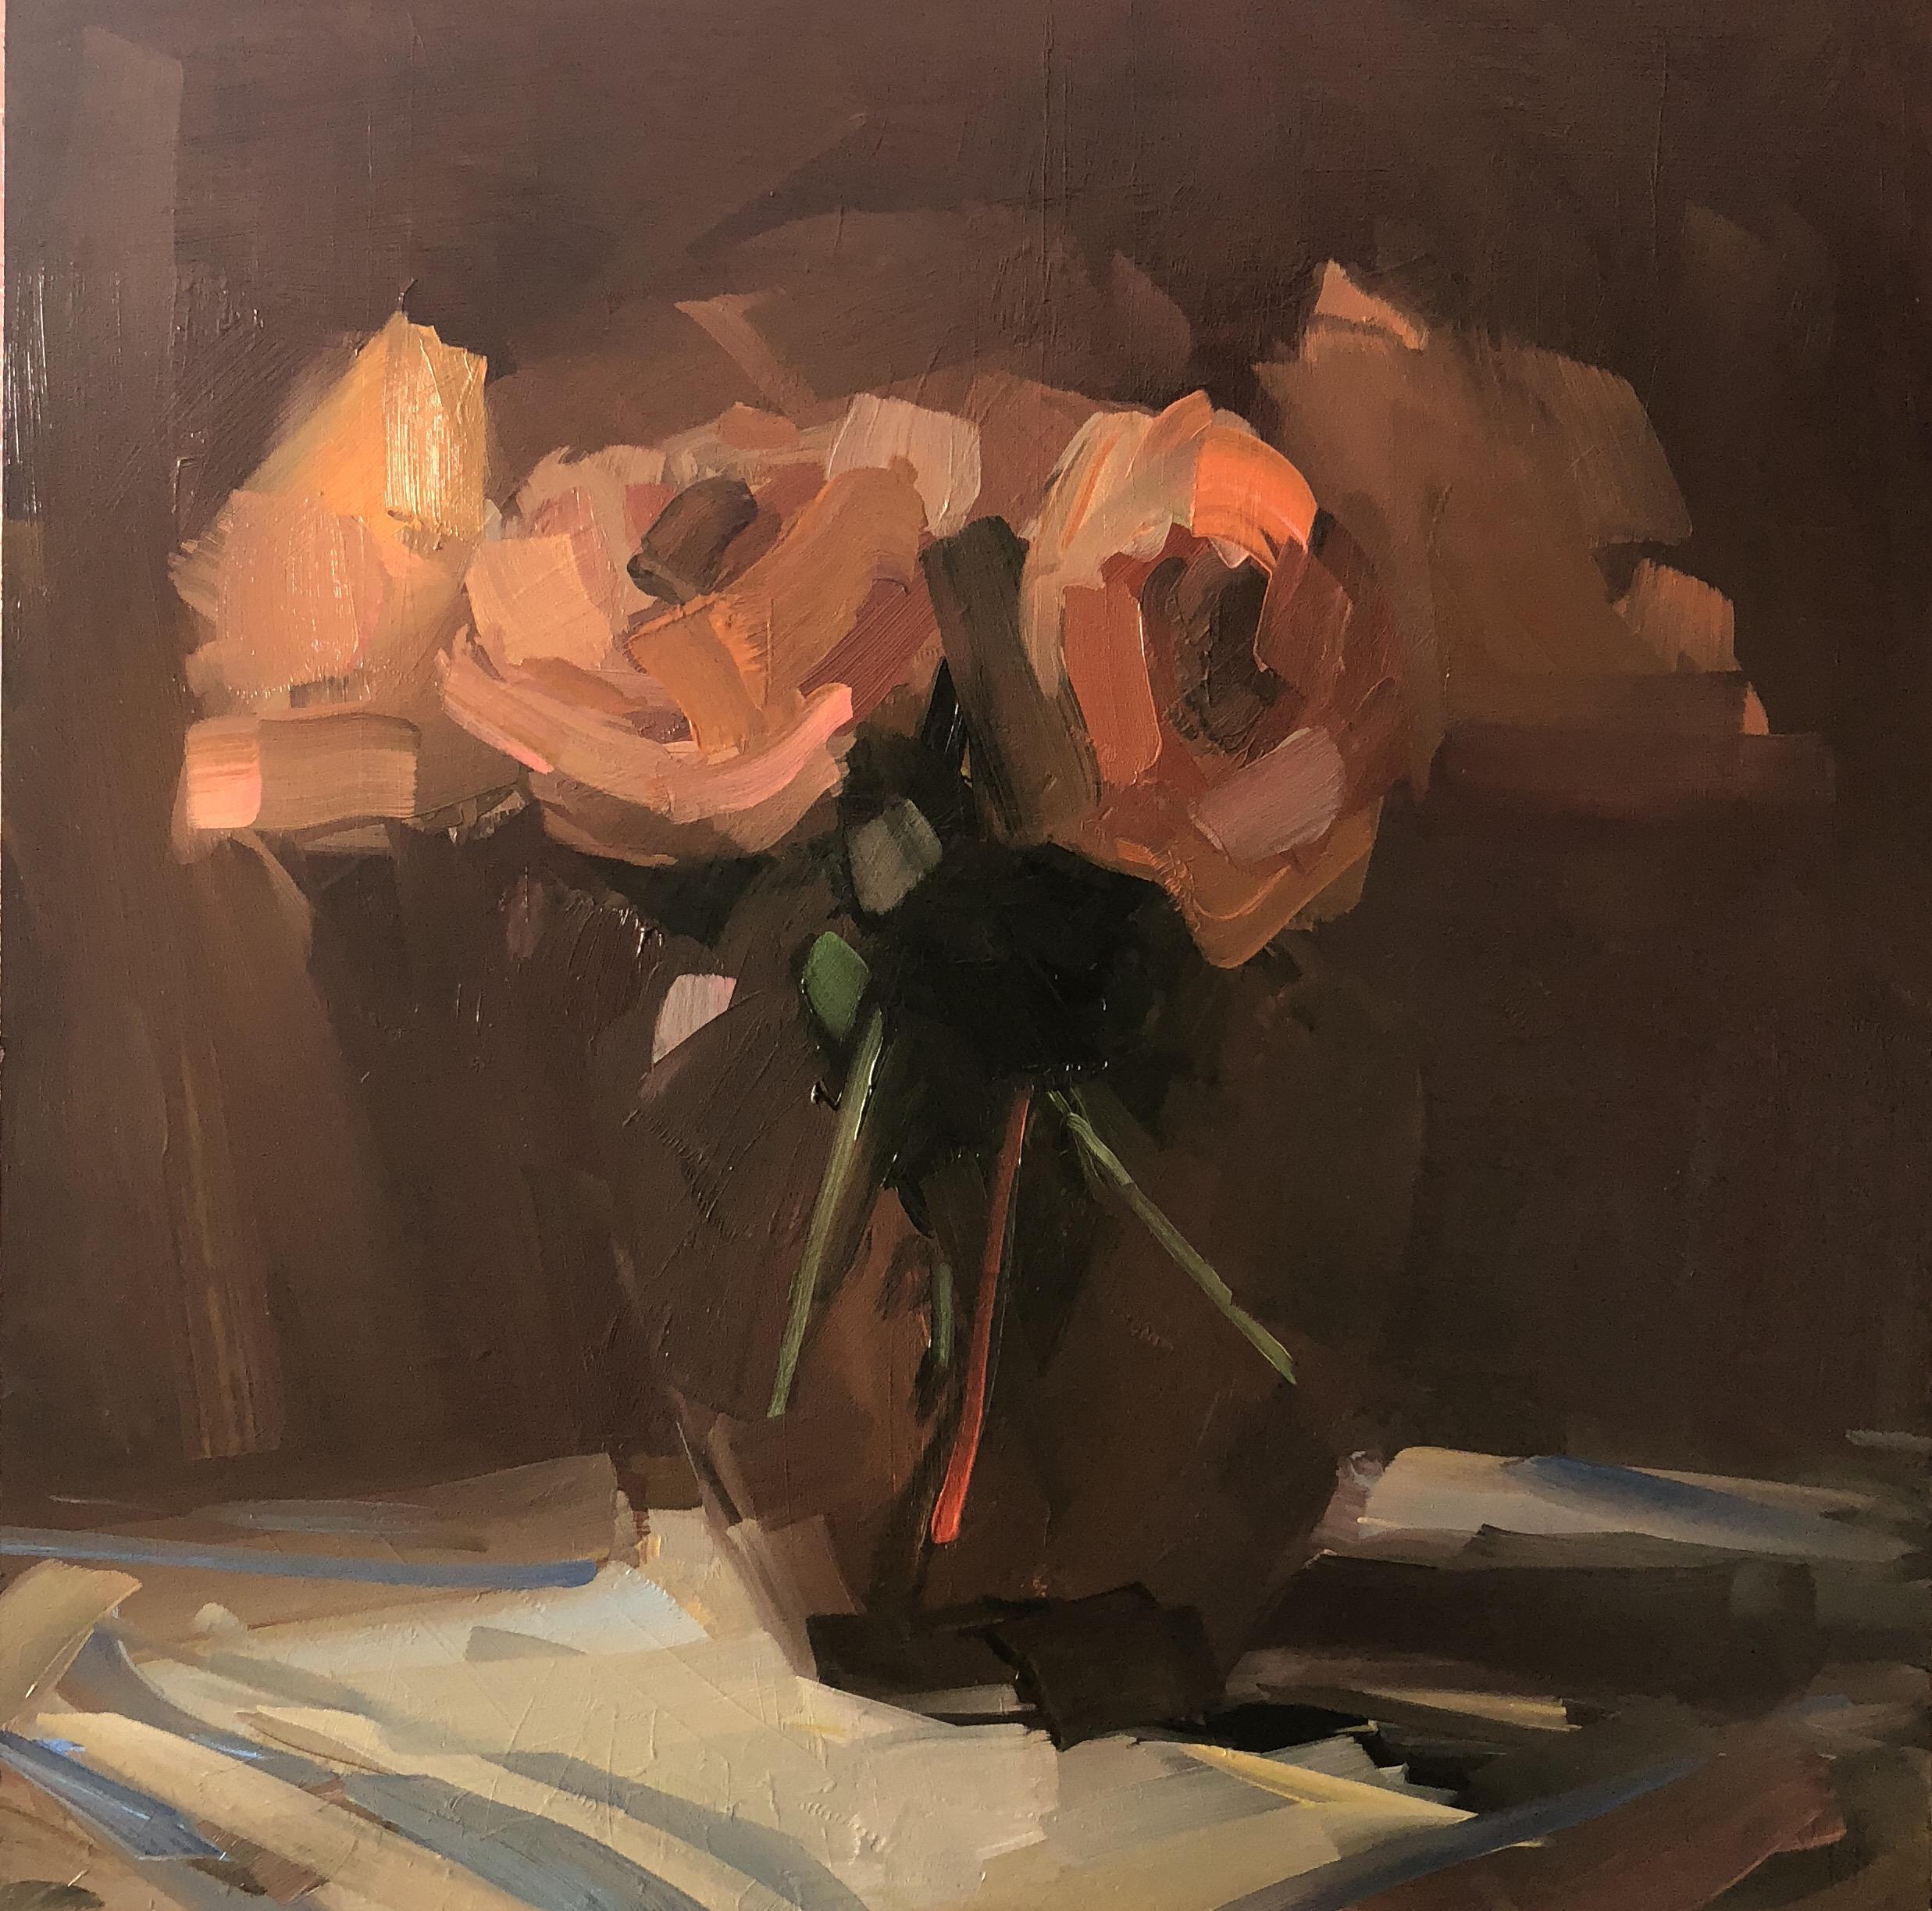 Orange Roses I, December